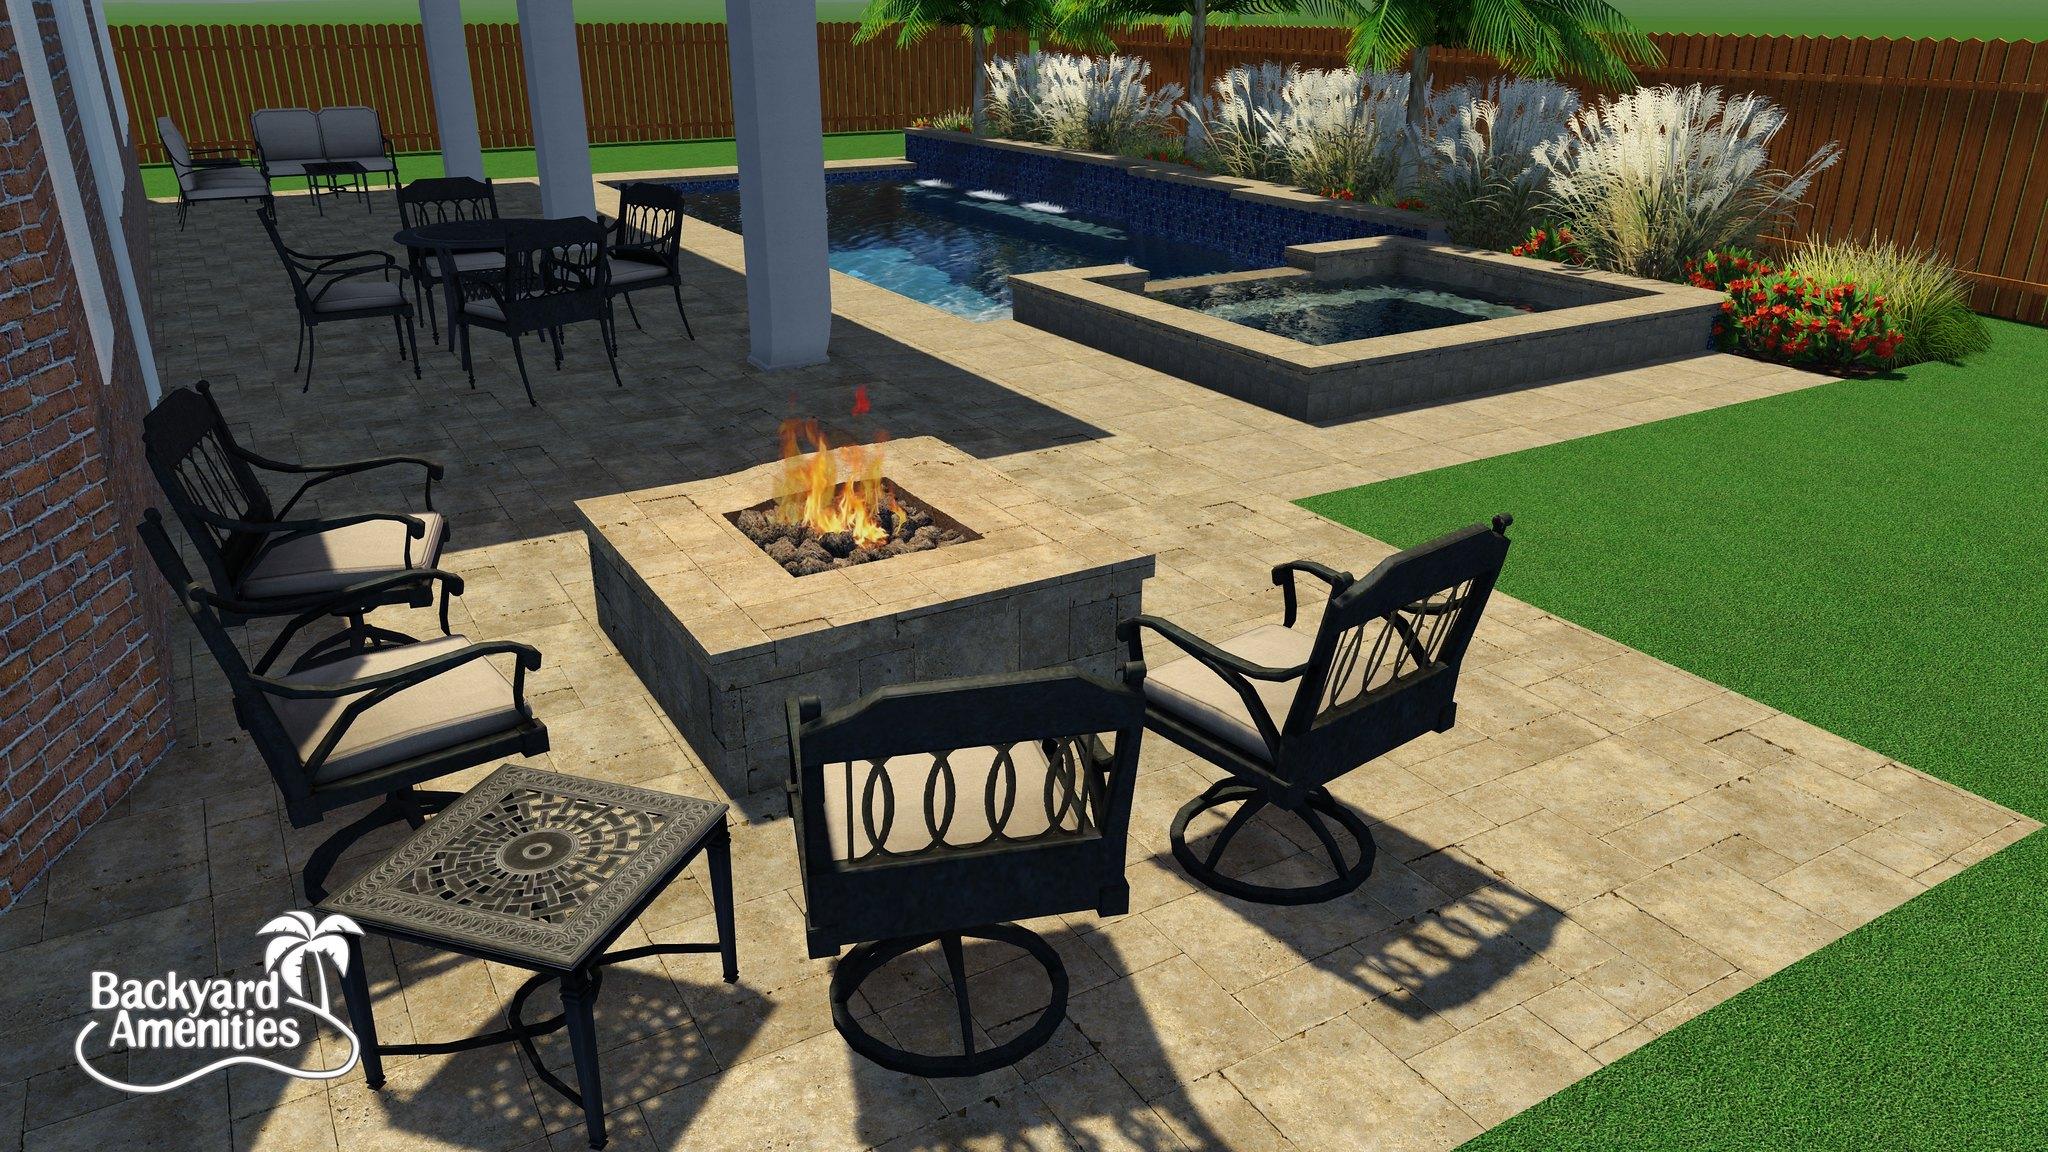 backyard amenities flickr photo sharing